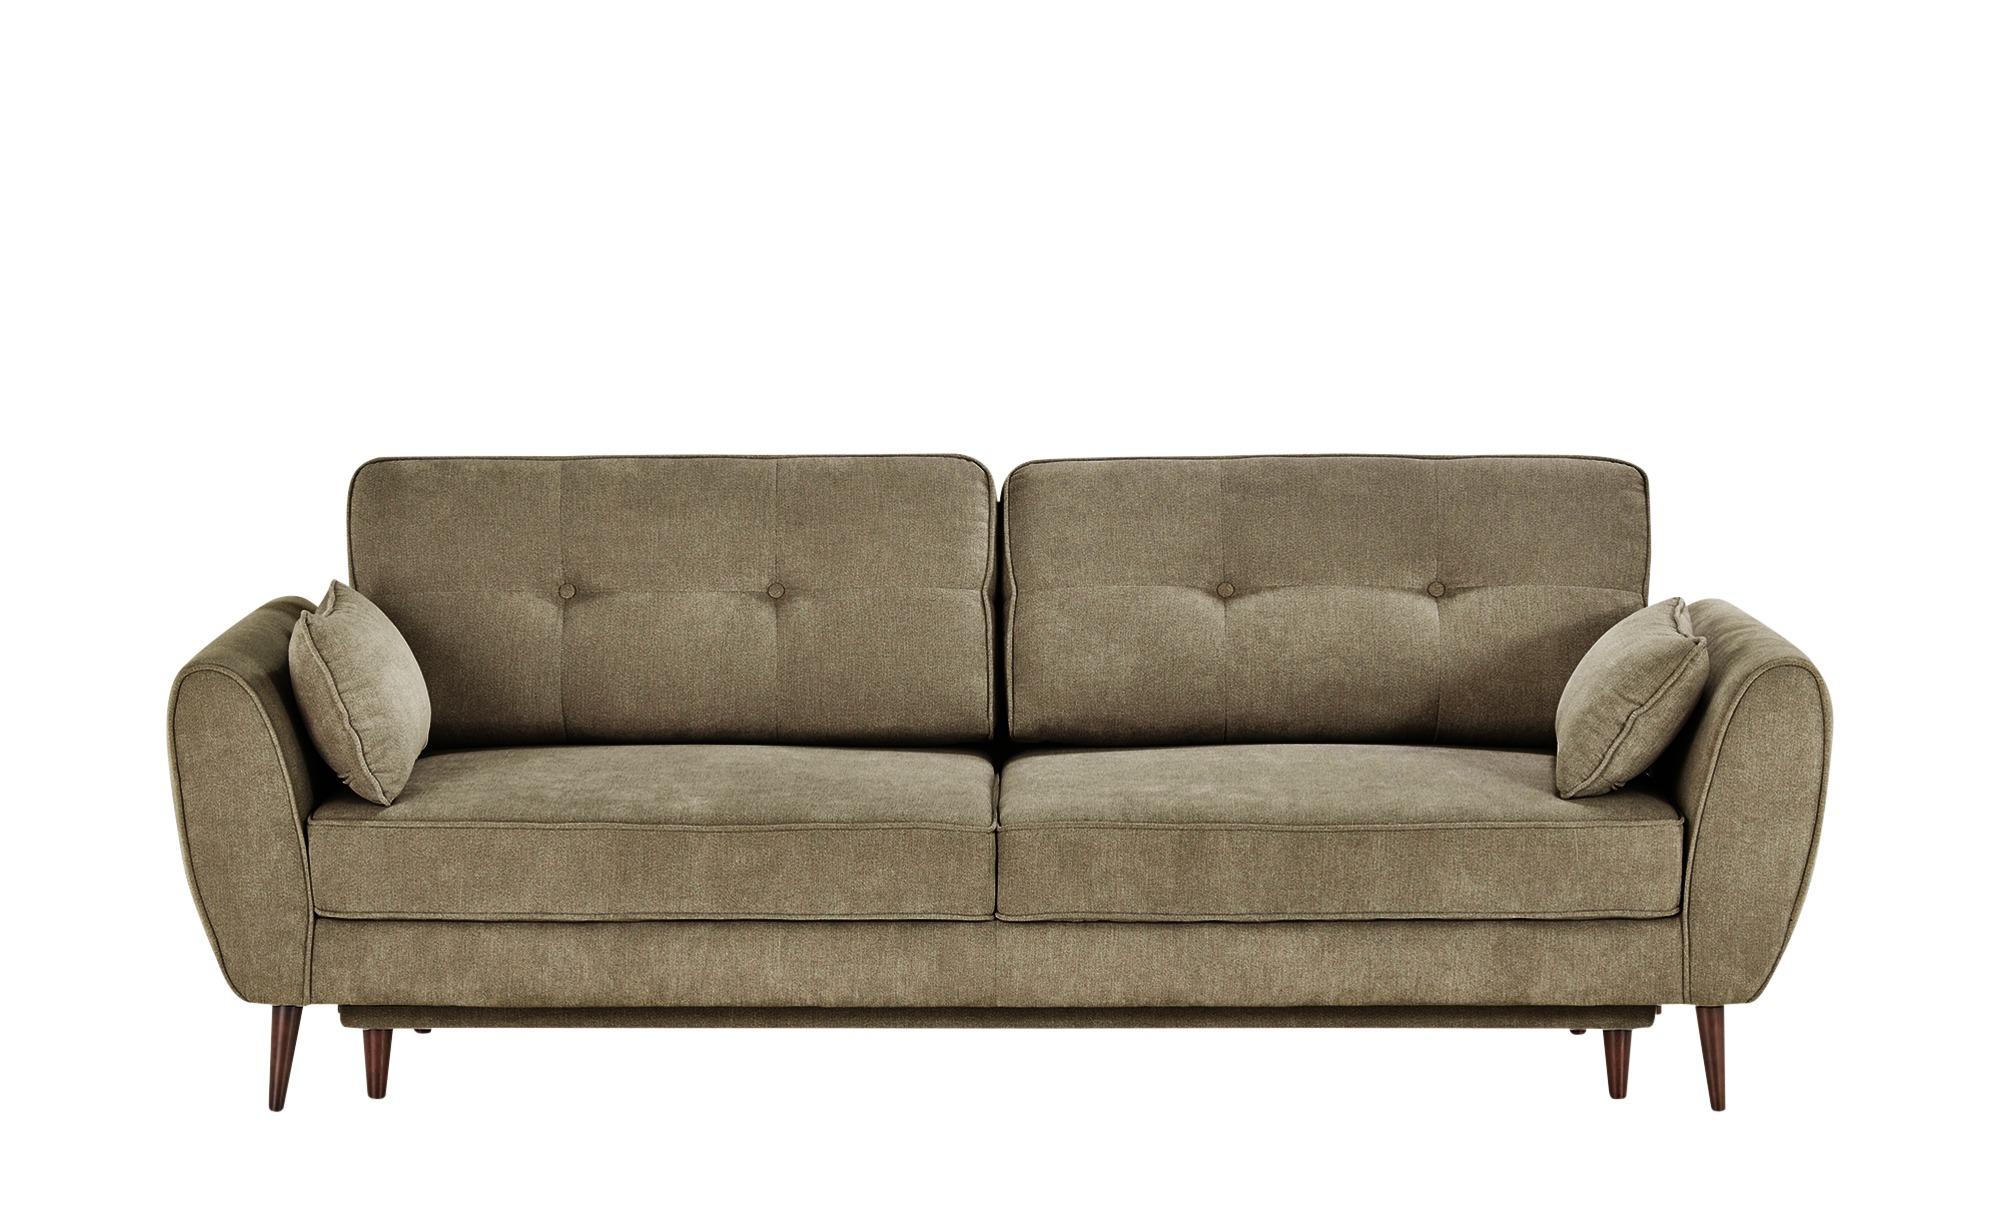 Switch Sofa Candy 3 Sitzer Schlamm Mobel Hoffner